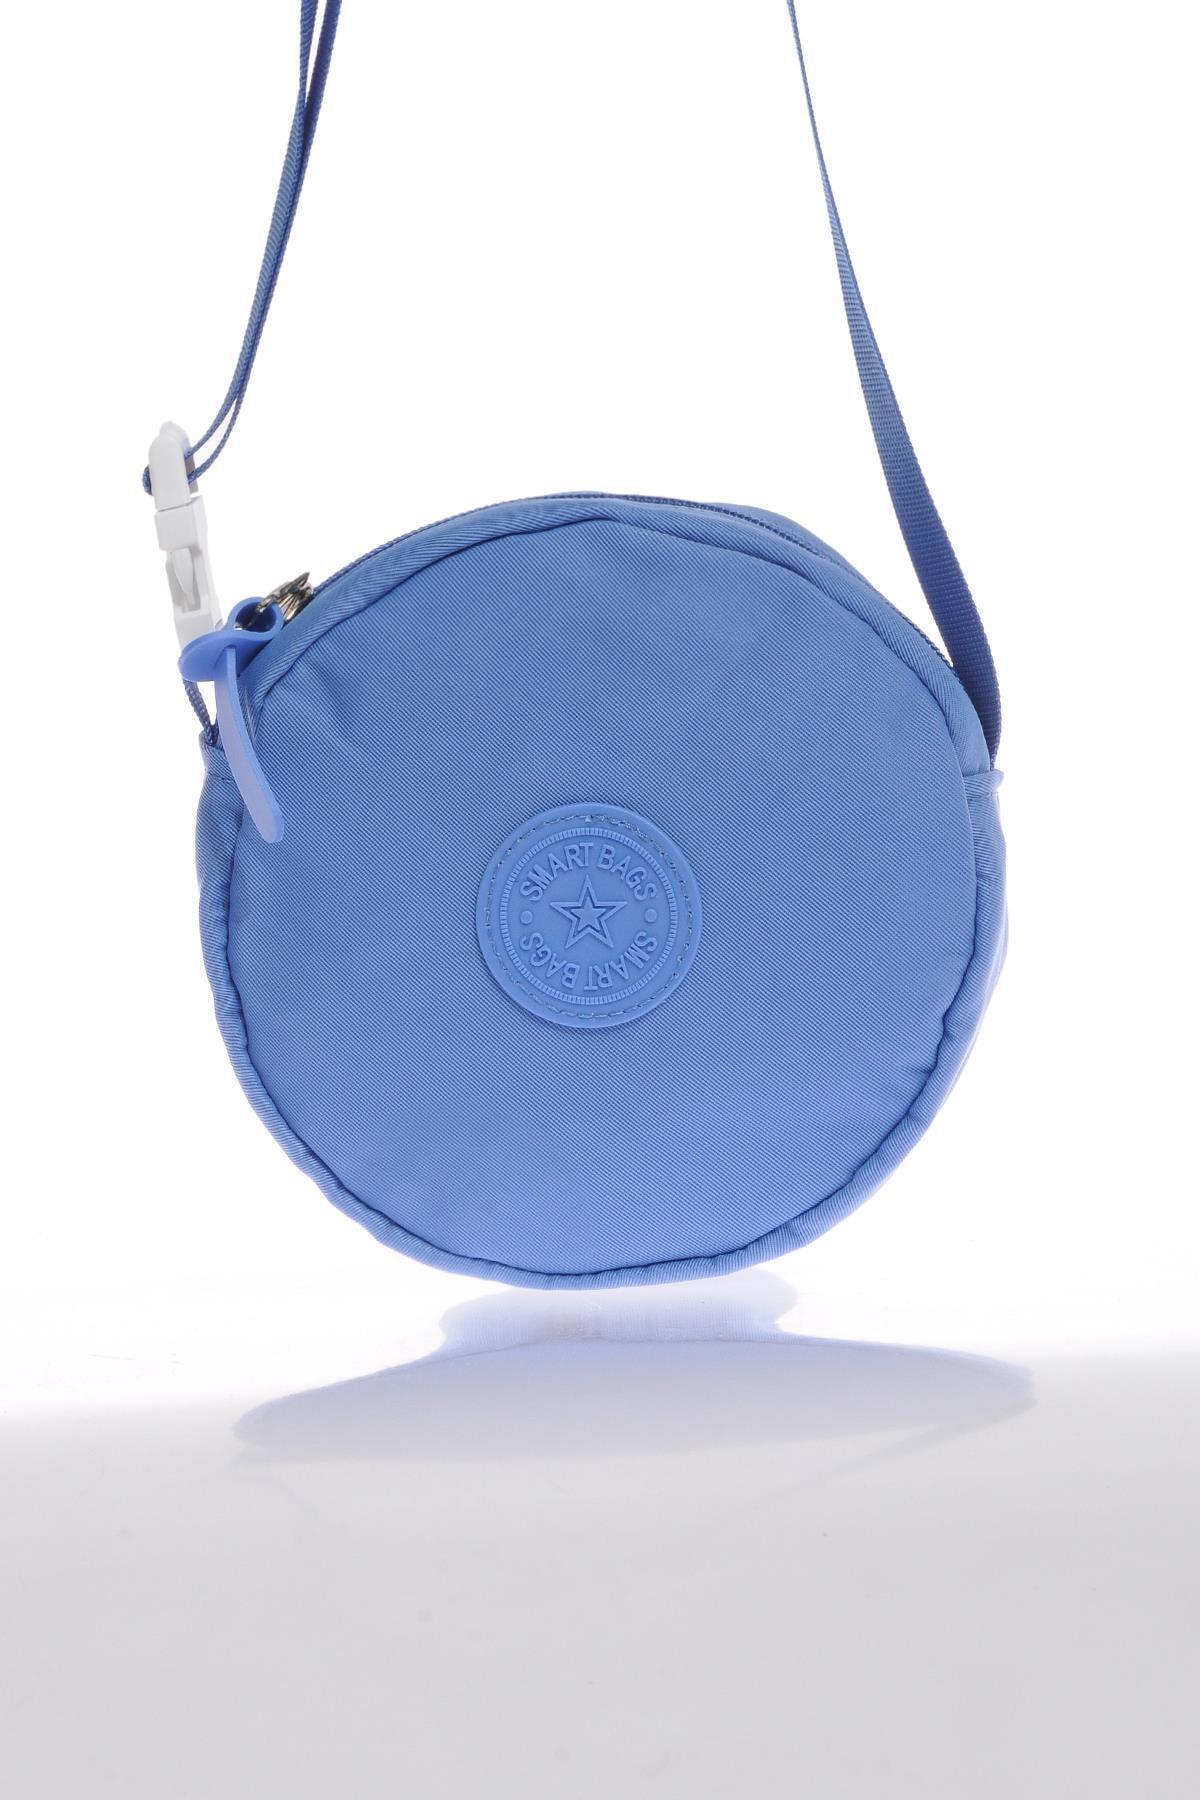 SMART BAGS Smb6001-0031 Mavi Kadın Minik Çapraz Çanta 1